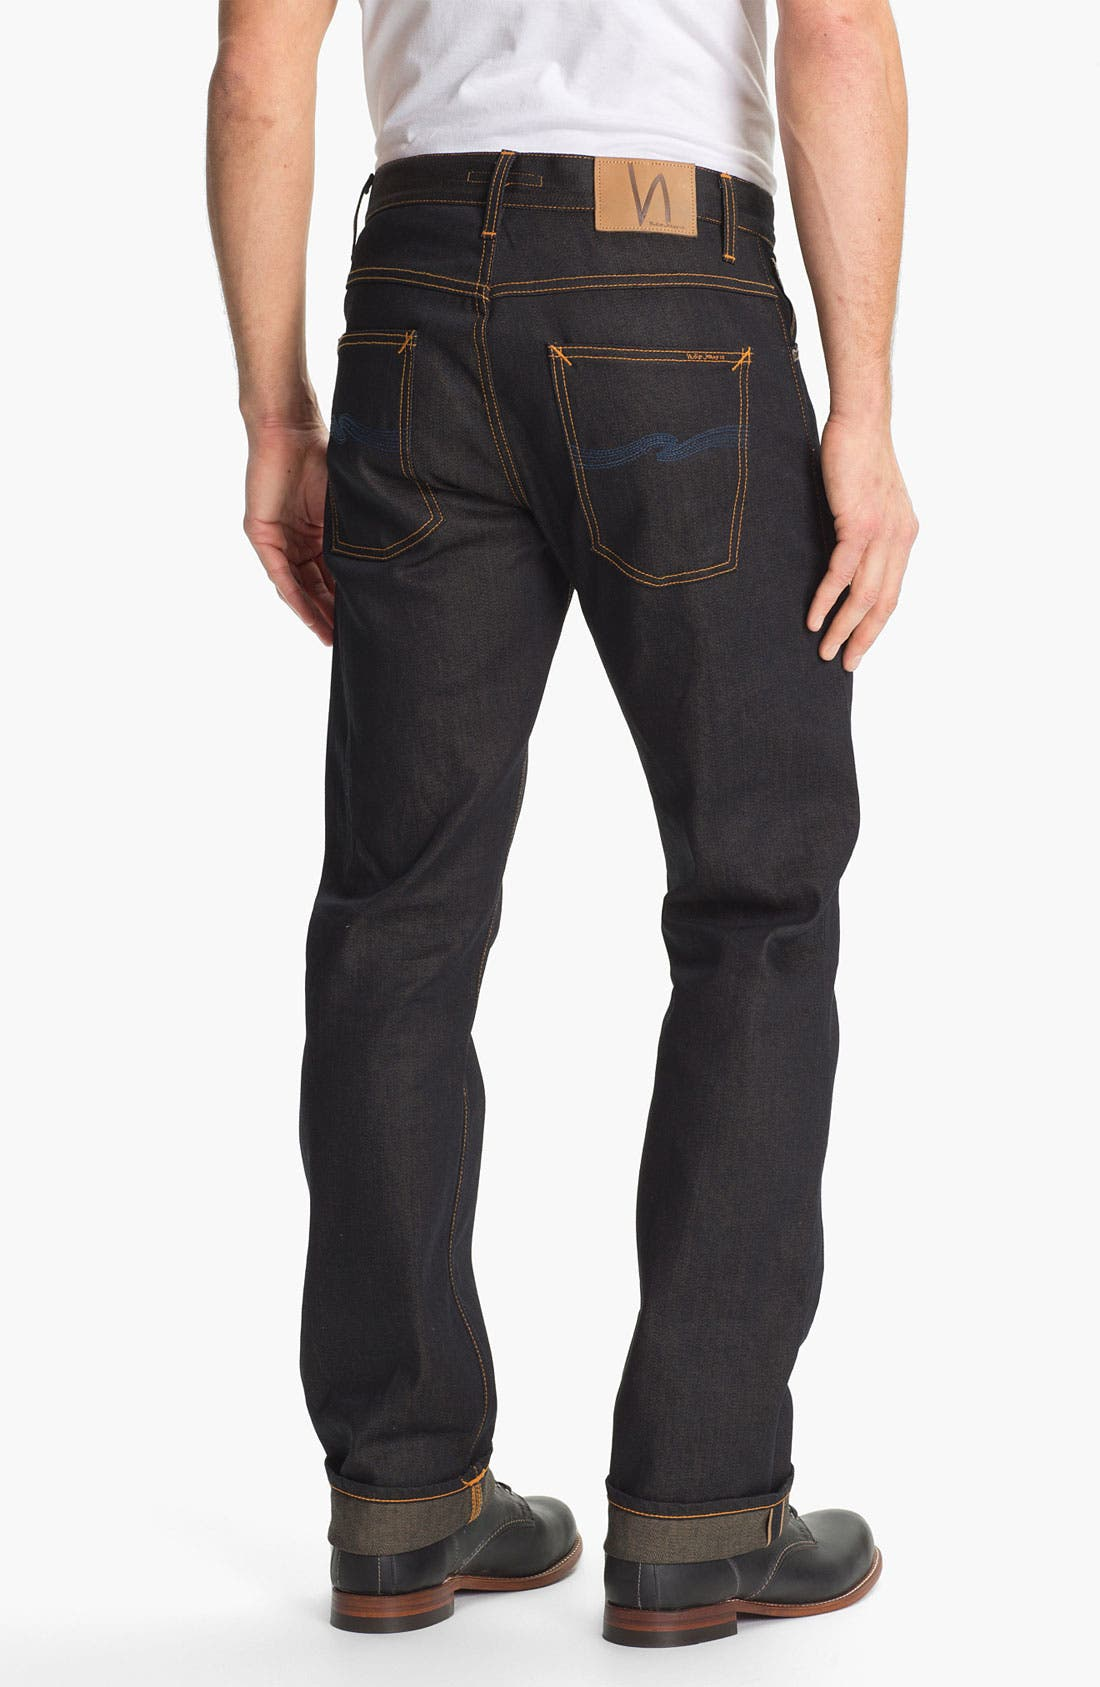 Alternate Image 1 Selected - Nudie 'Average Joe' Straight Leg Jeans (Organic Dry Brown Selvedge)